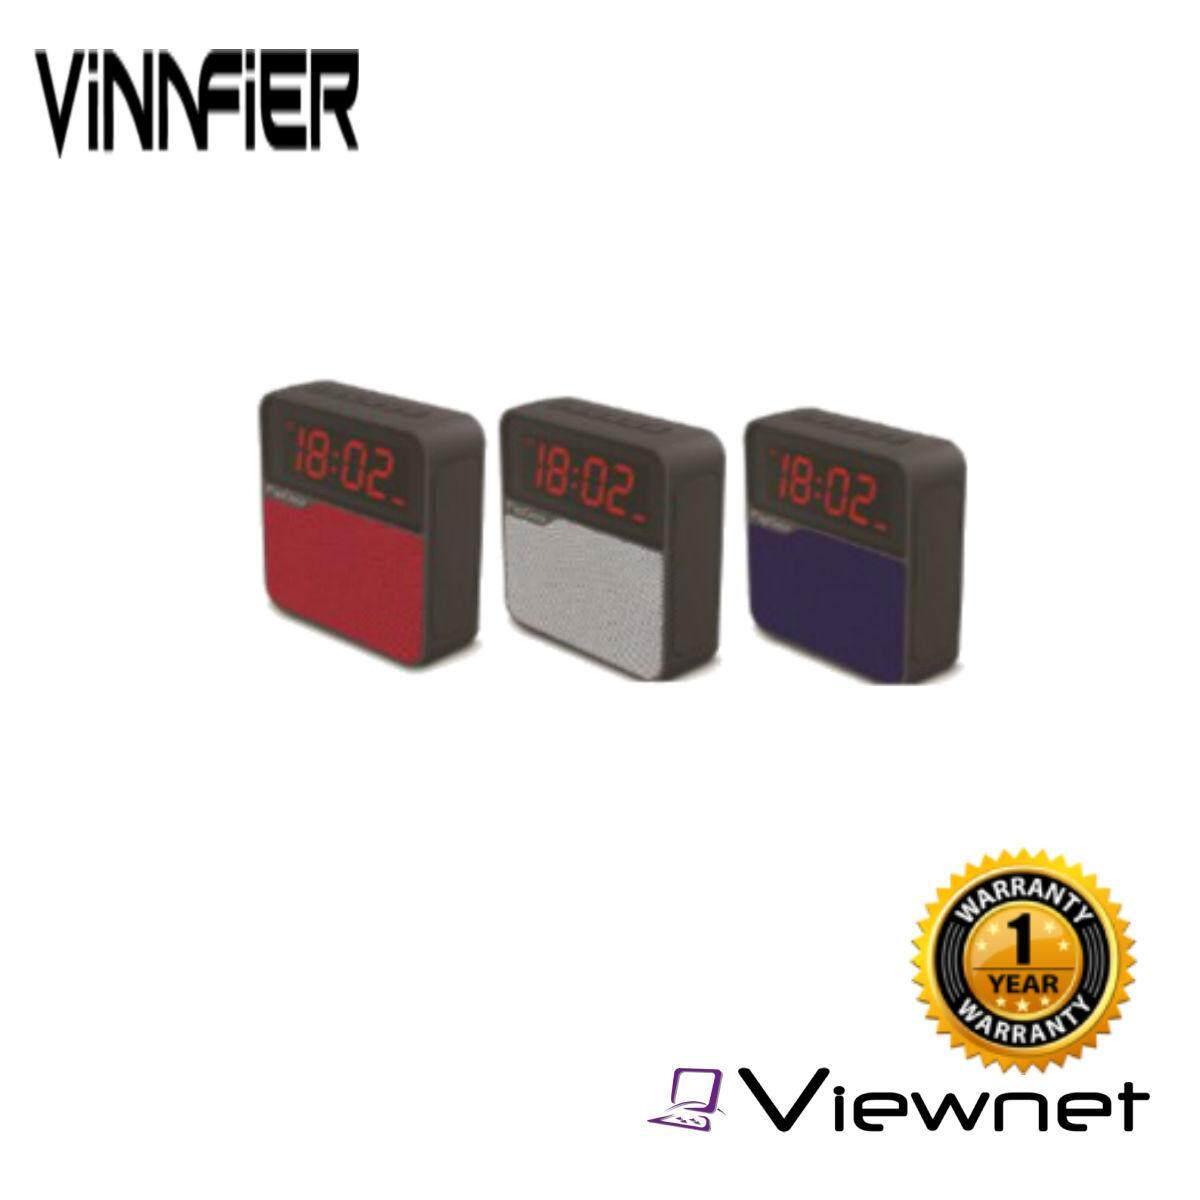 Vinnfier Flipgear Tango Neo 7 Bluetooth Alarm Clock Speaker (Black/Blue/Red/Grey)